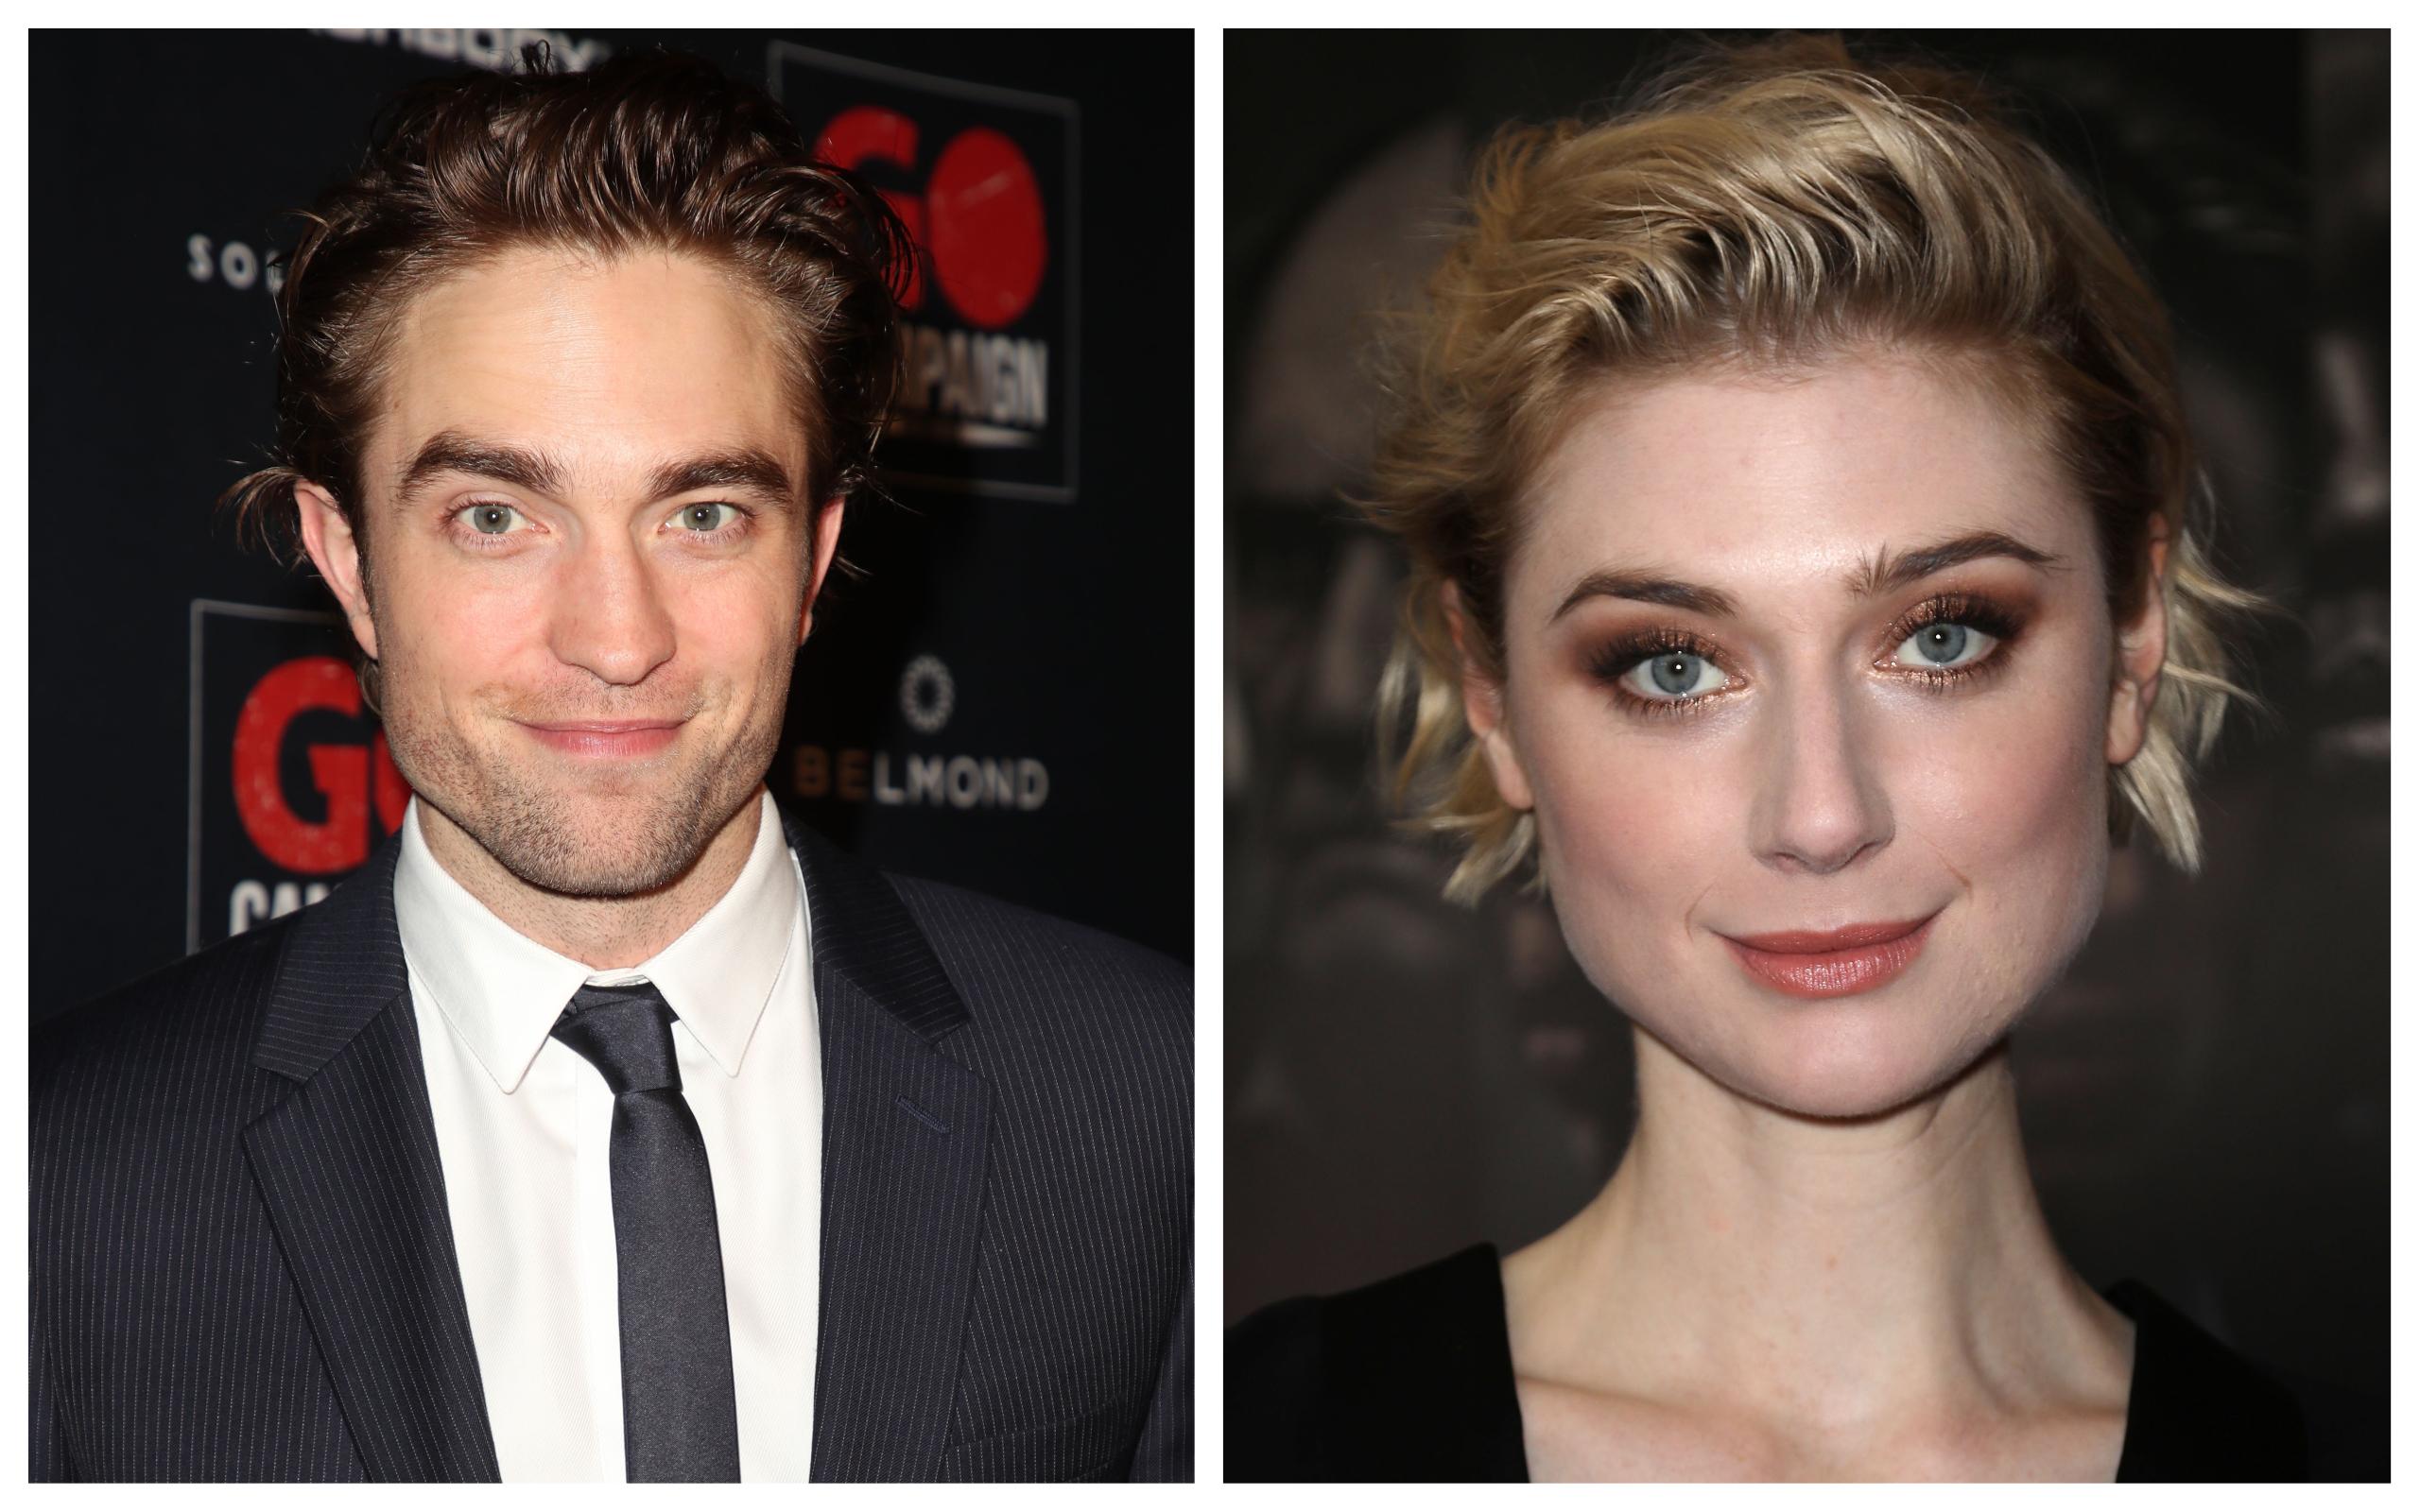 Flipboard: Robert Pattinson Rewatched 'The Twilight Saga ...